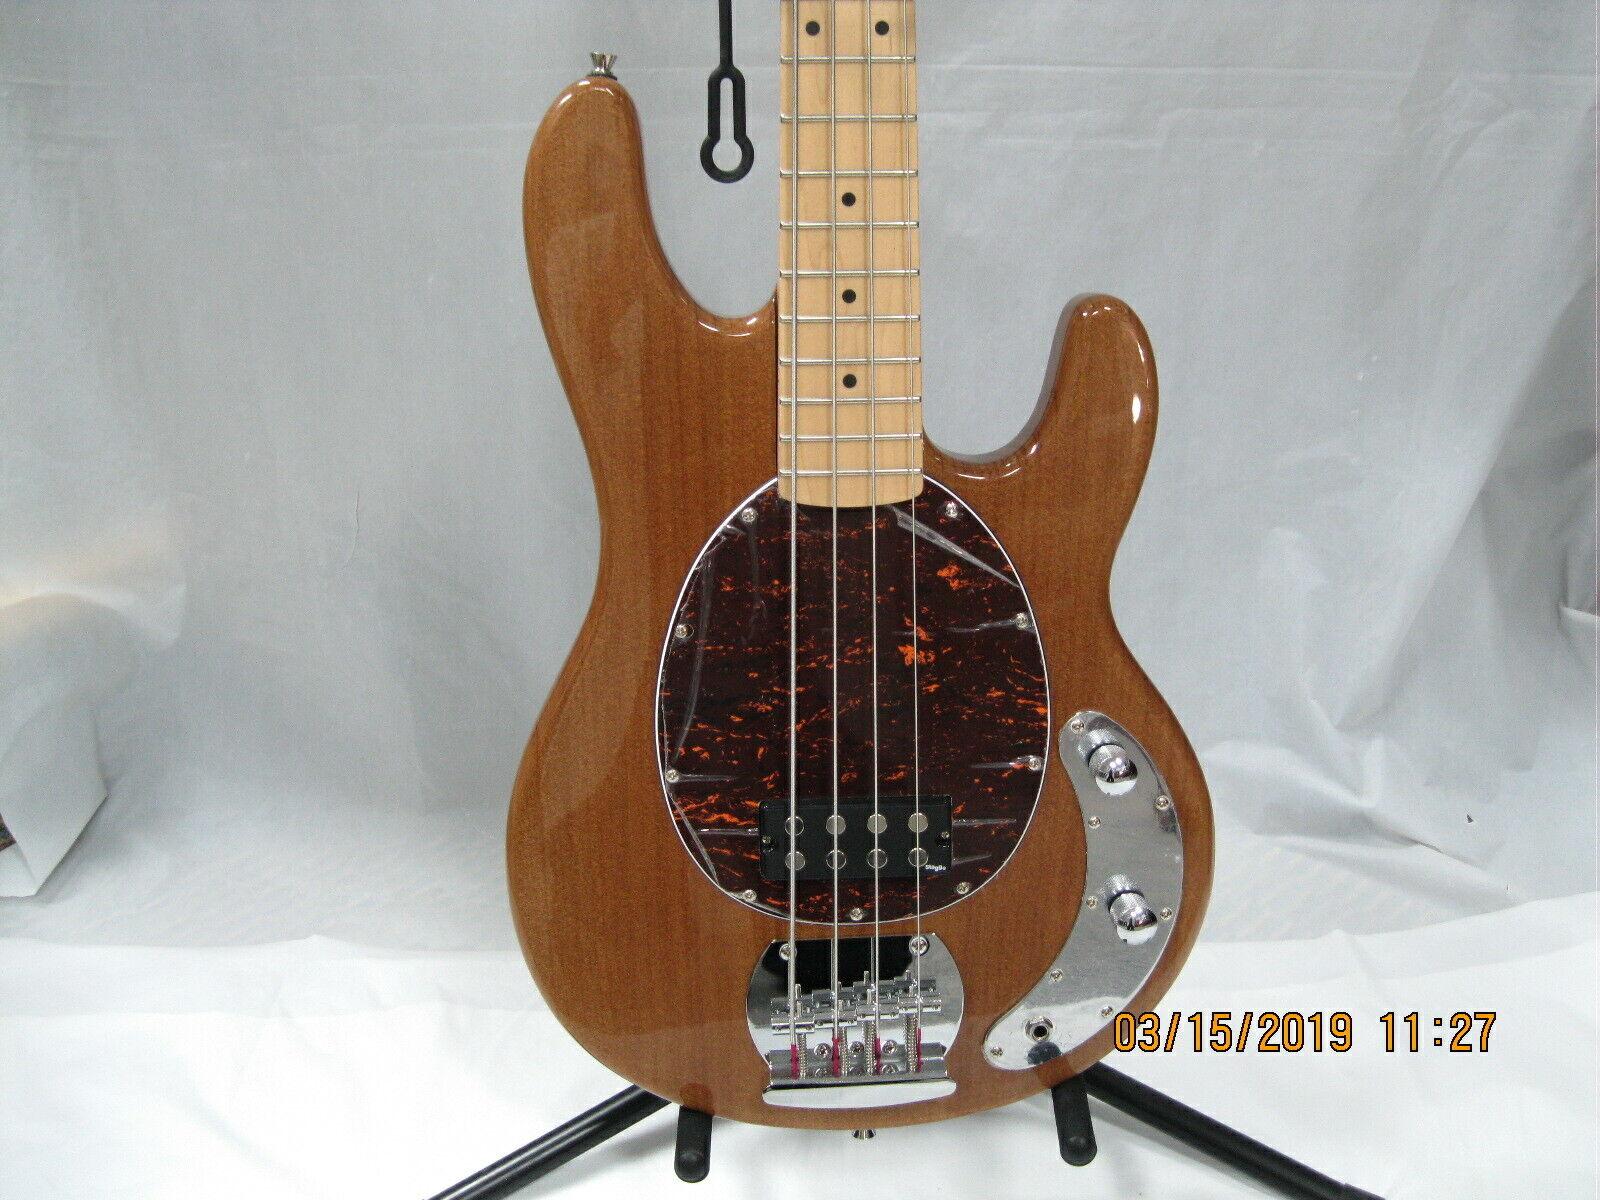 Stagg vintage b mb 300n bass guitar